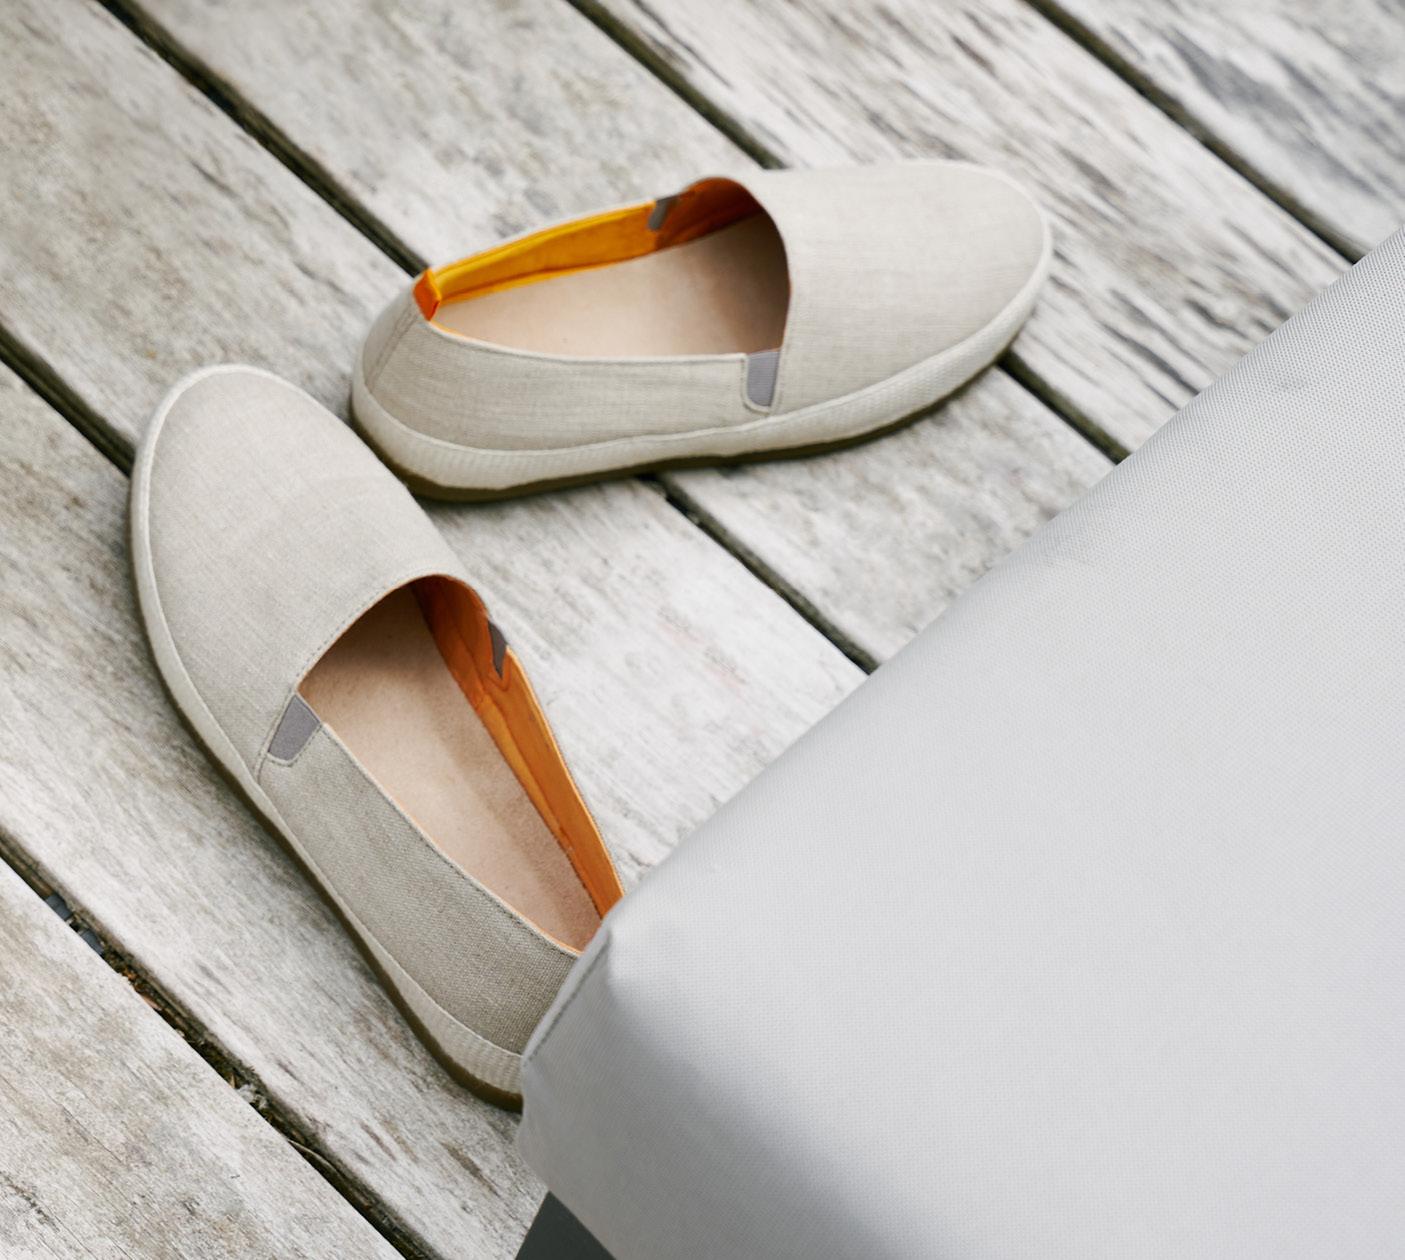 Summer Style - Mens Beige Linen Espadrilles